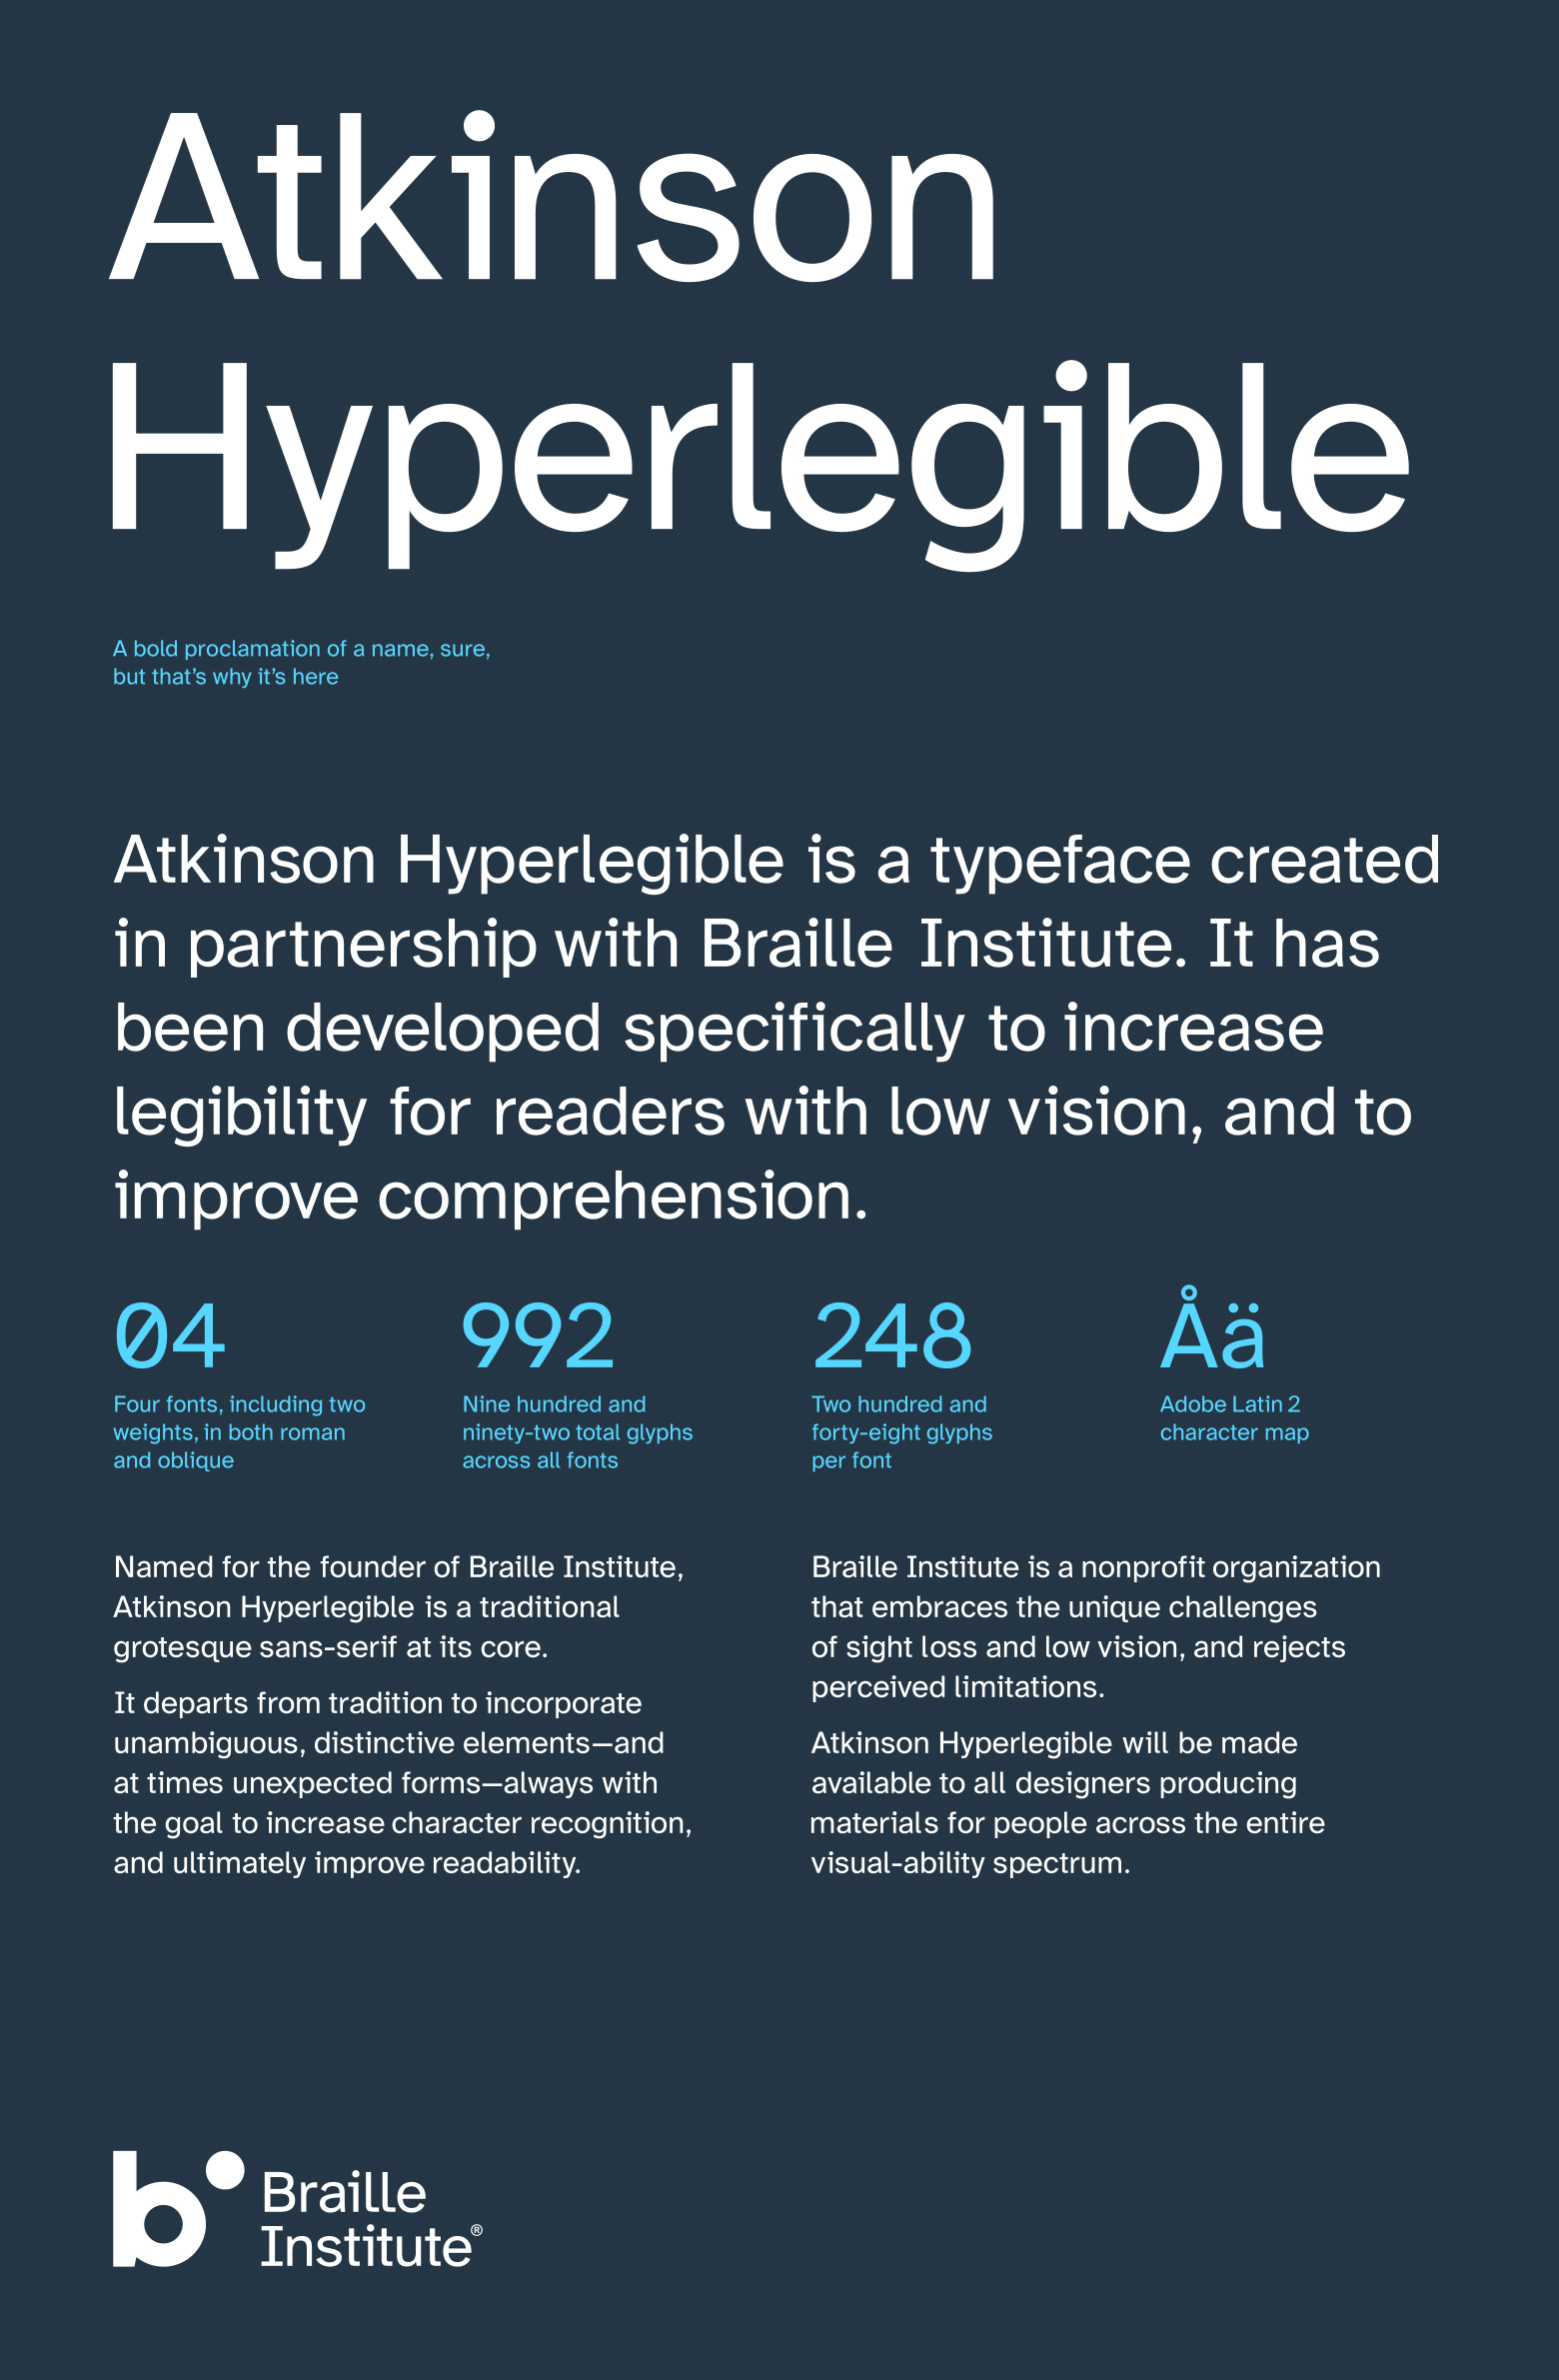 Atkinson_Hyperlegible_2_1500px.jpg